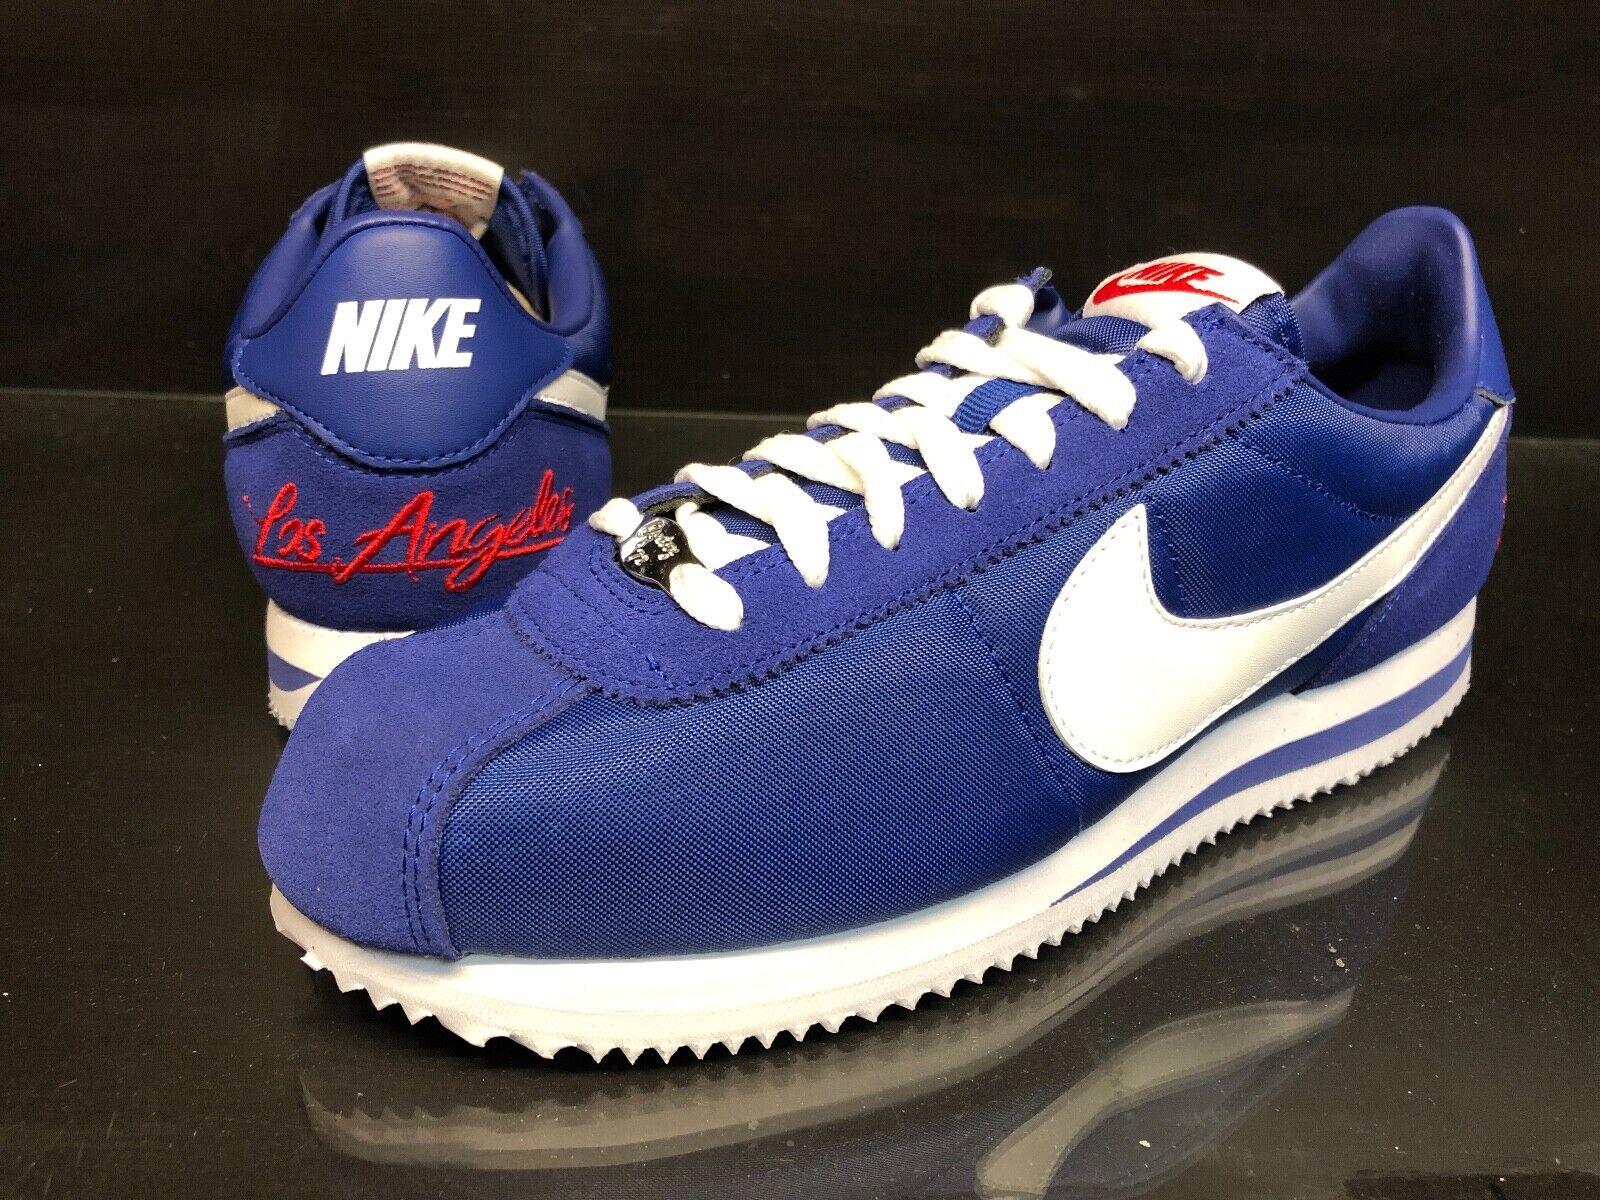 Nike Cortez Los Angeles - Royal  - 9  fabbrica diretta